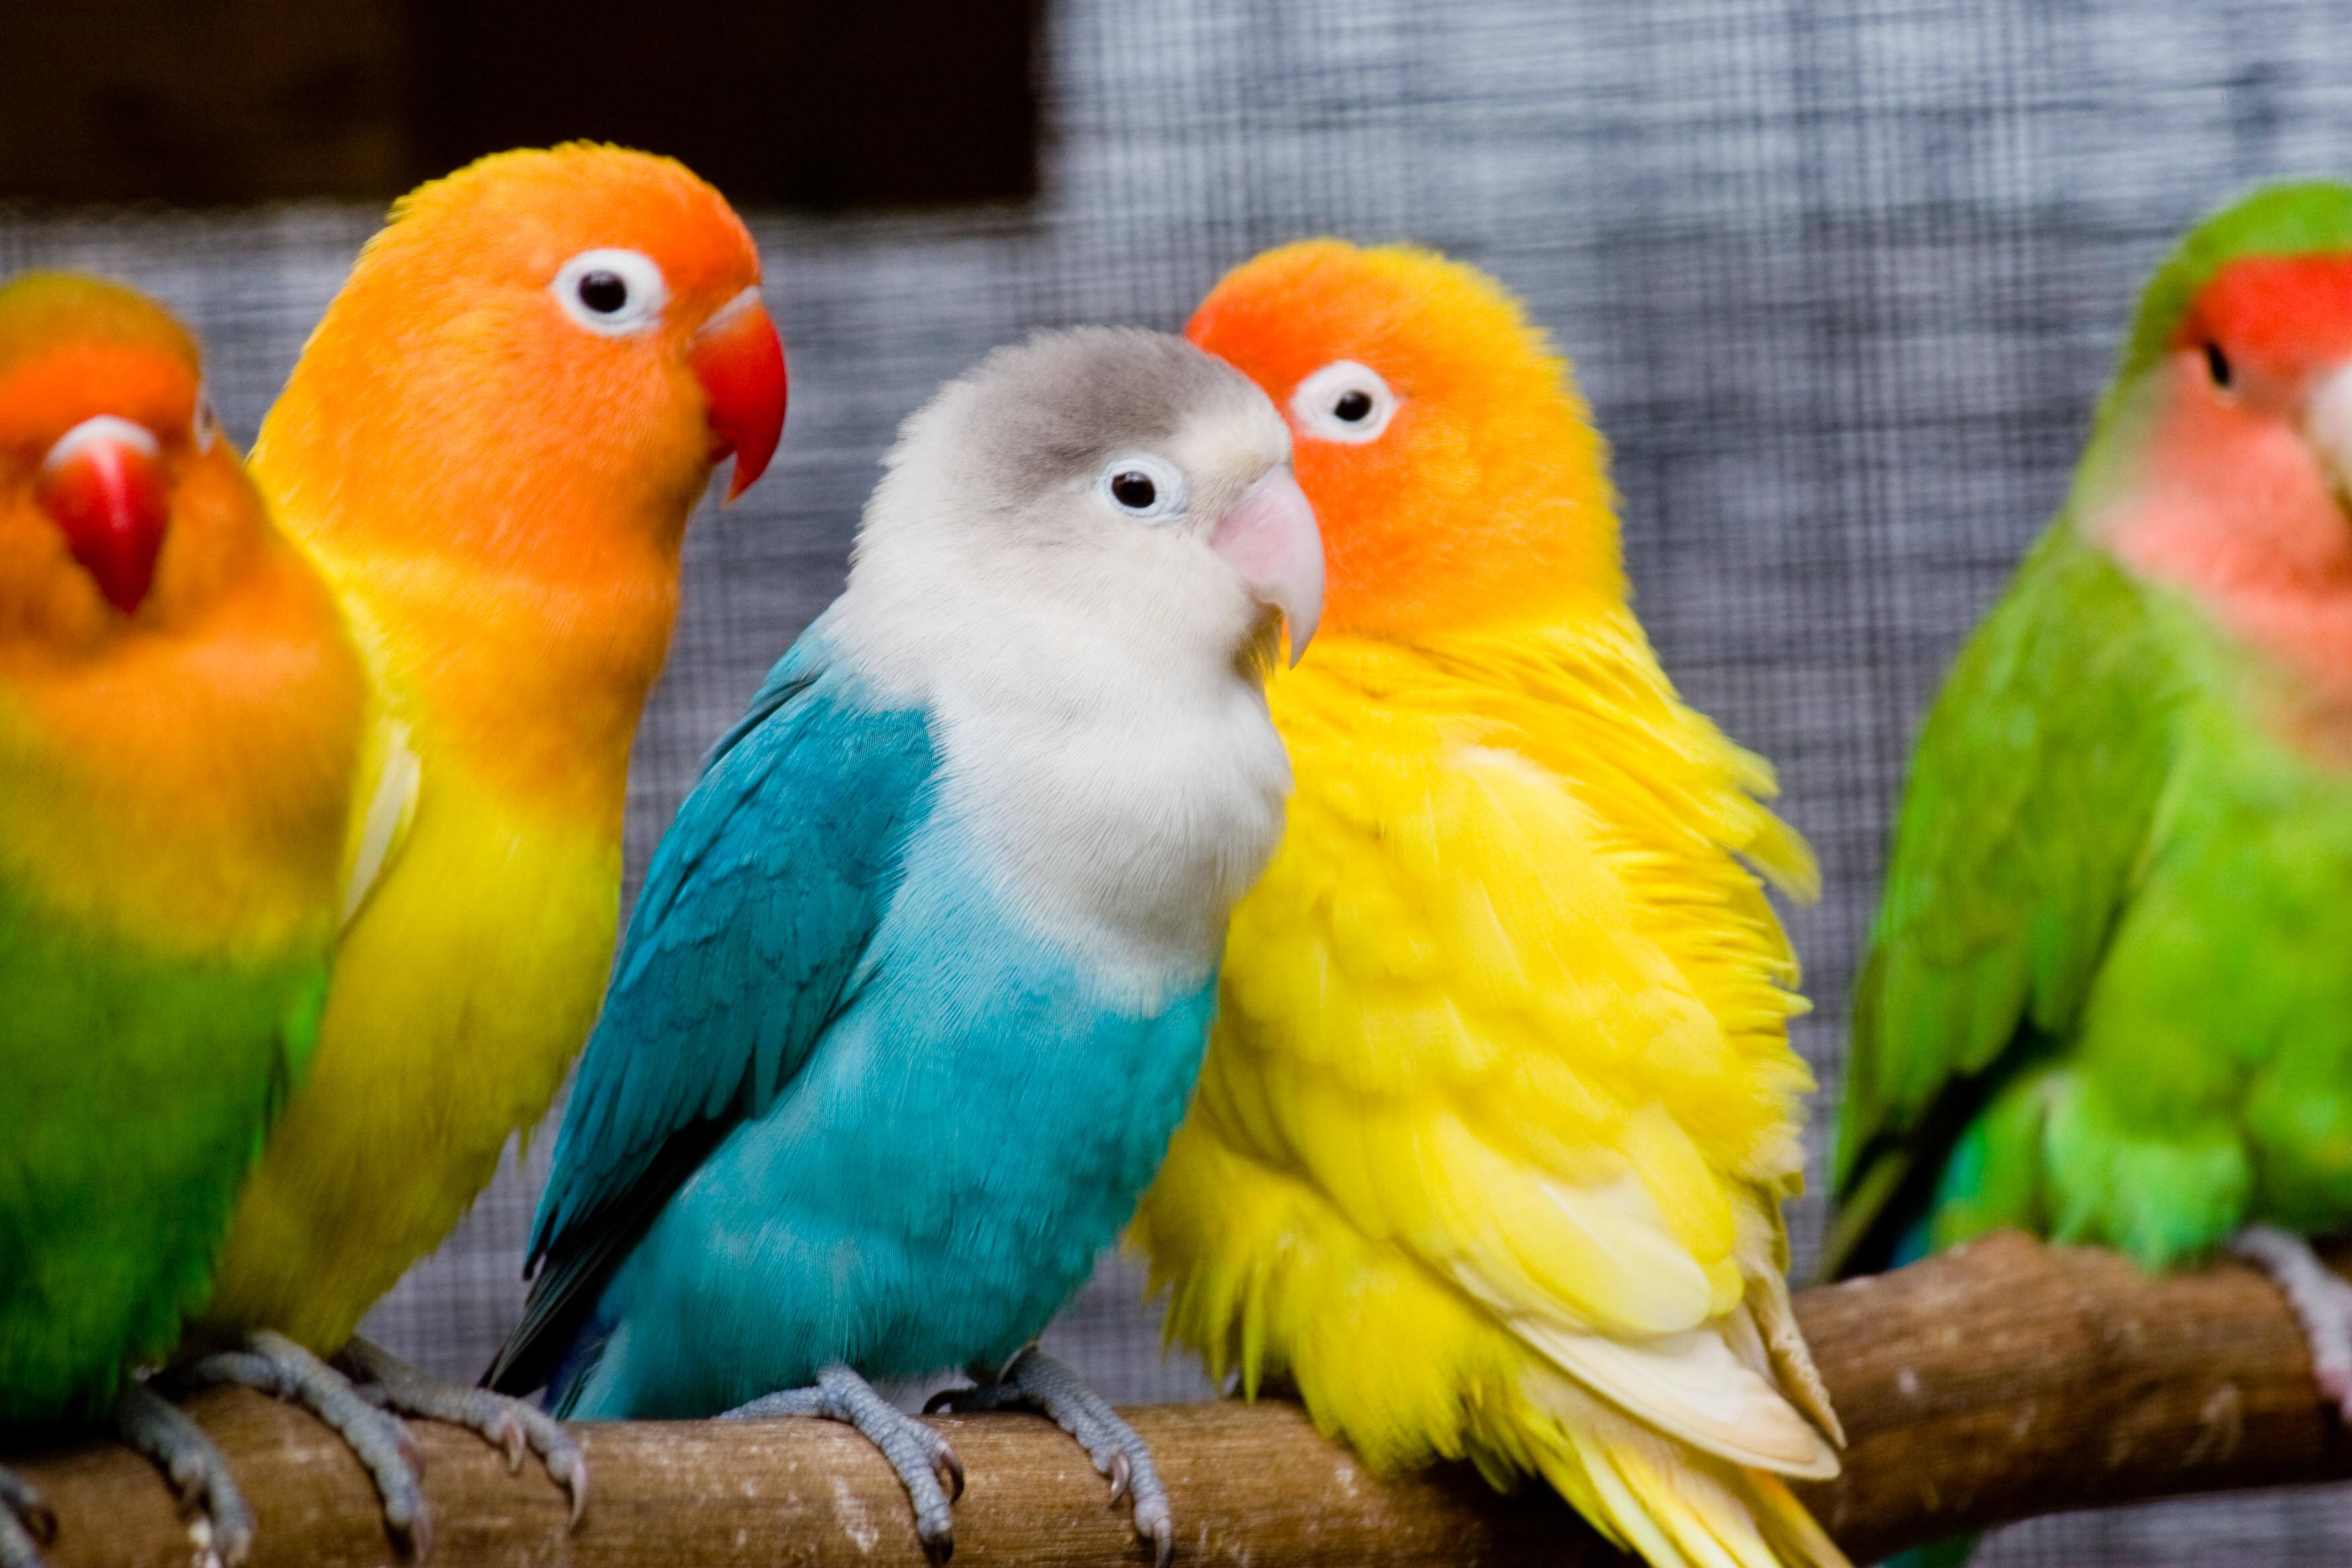 Lovebirds_on_a_perch-8b